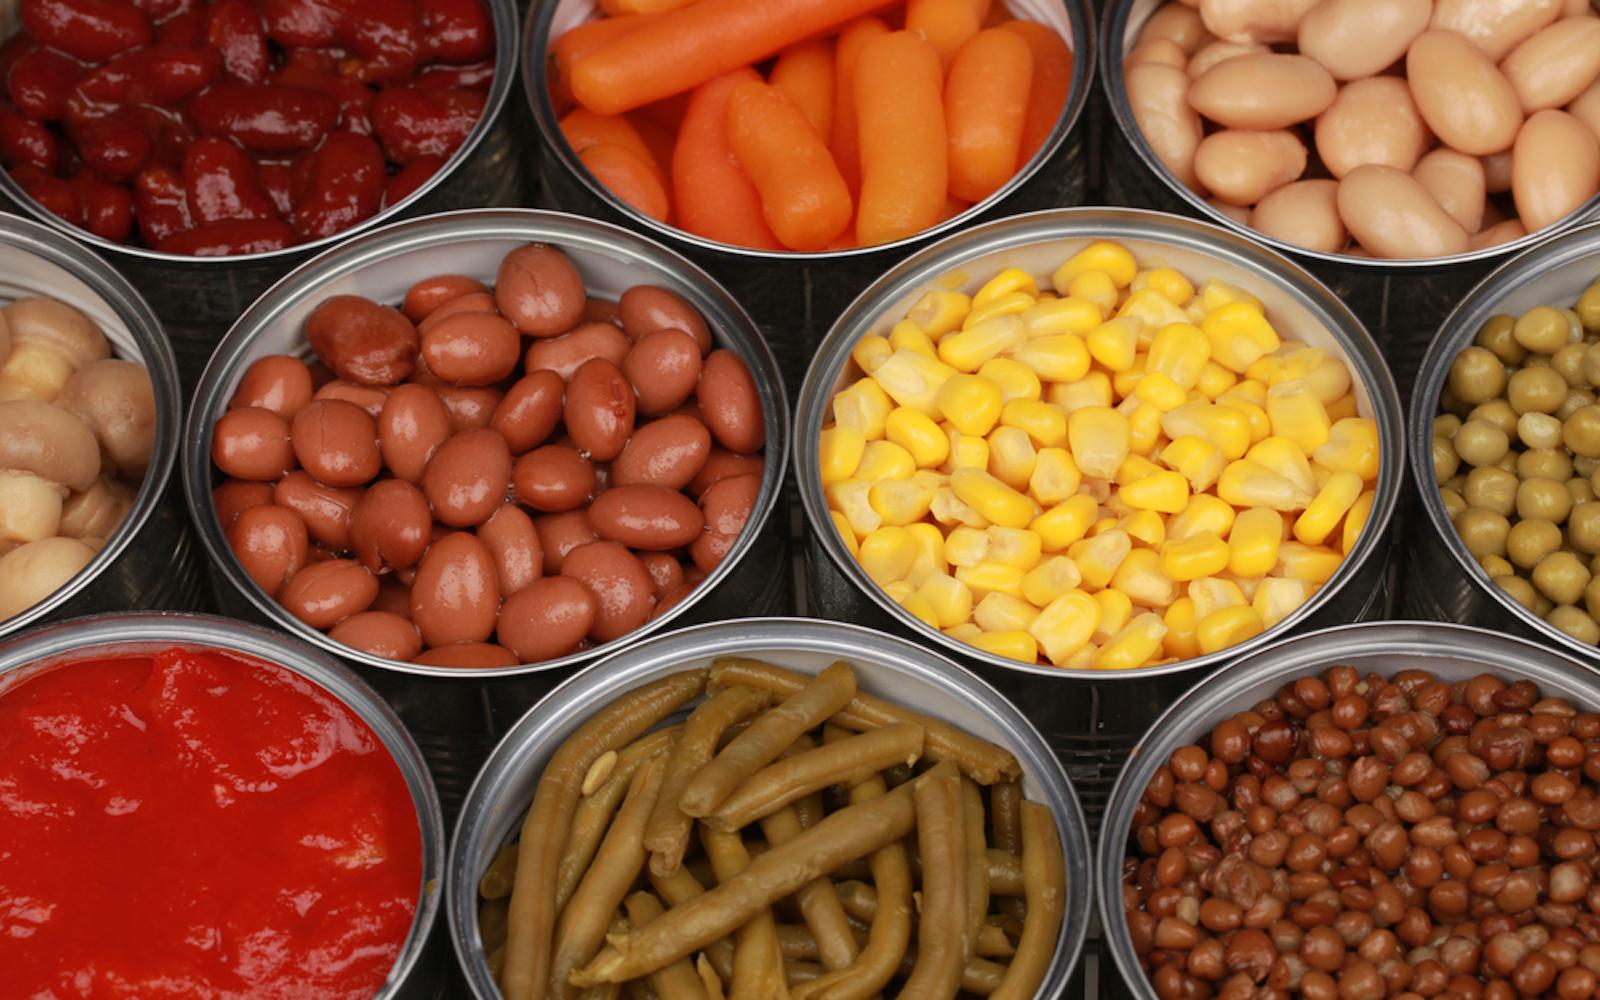 canned vegetables vegan food